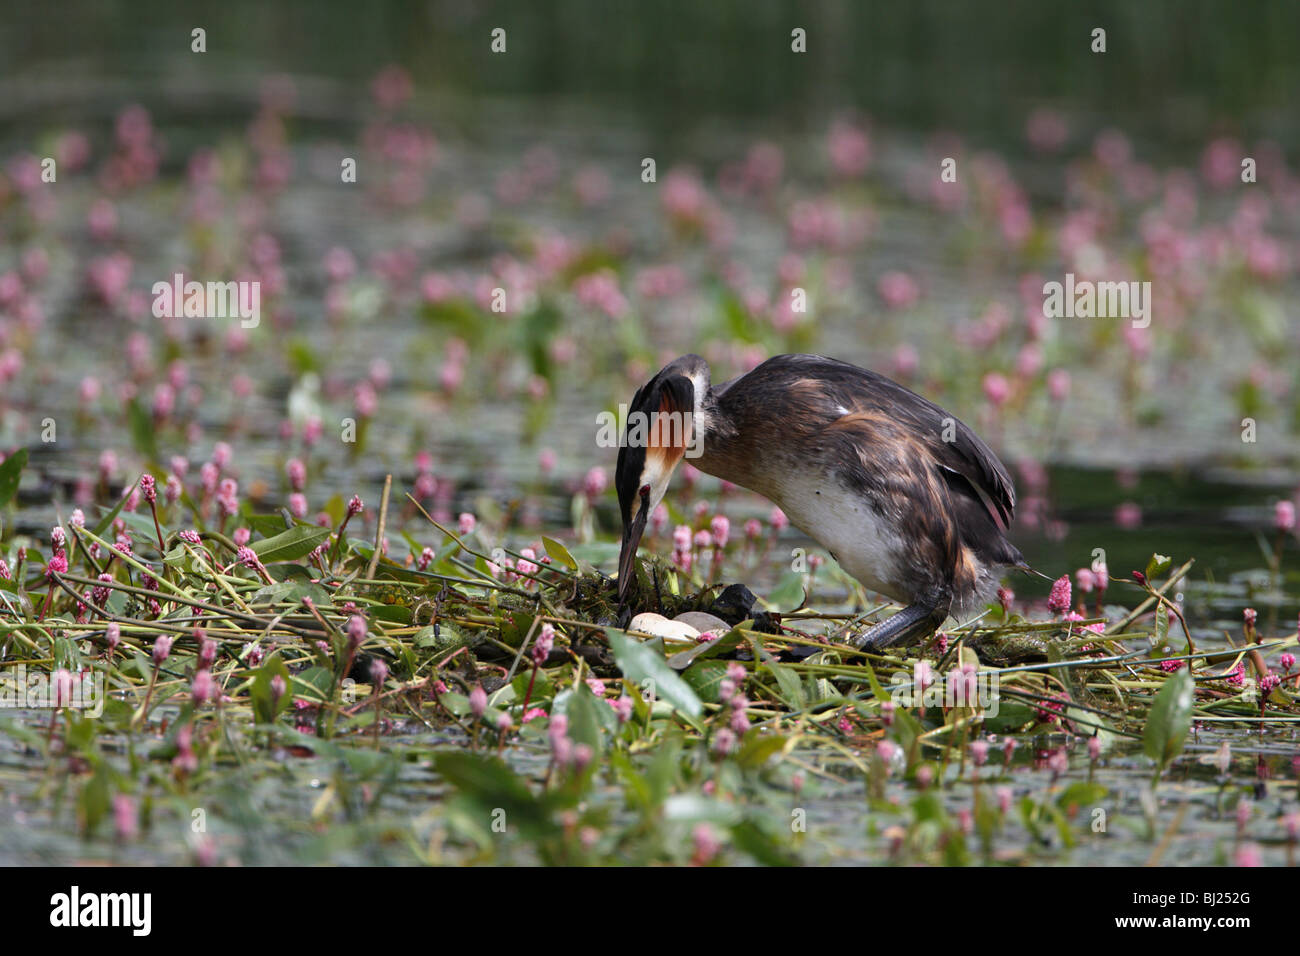 Great Crested Grebe, Podiceps cristatus turning eggs on nest - Stock Image